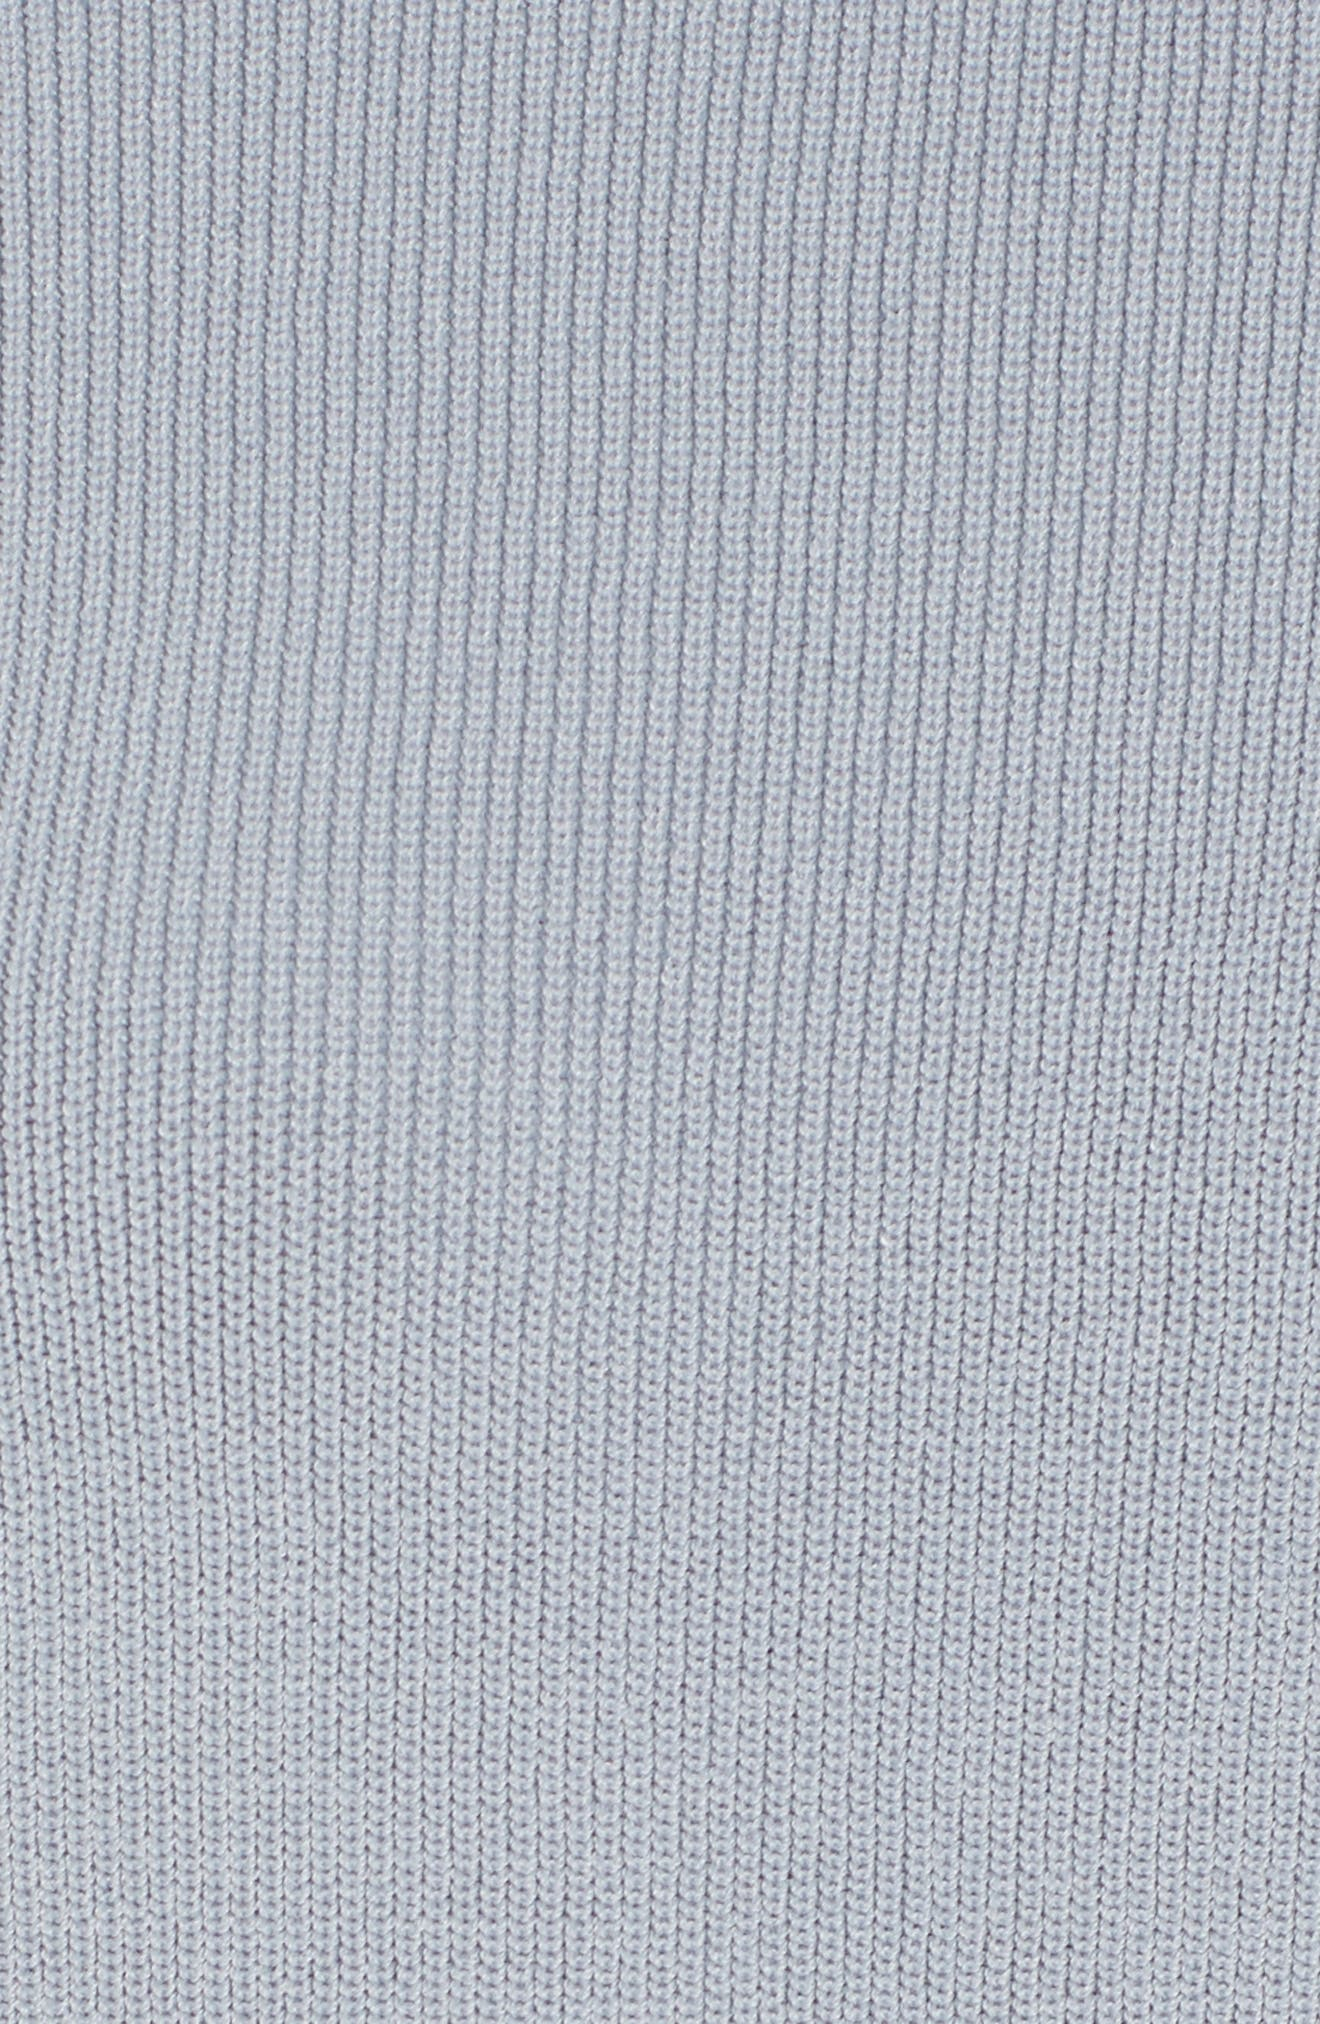 Alternate Image 5  - J.O.A. Lace-Up Sleeve Sweater